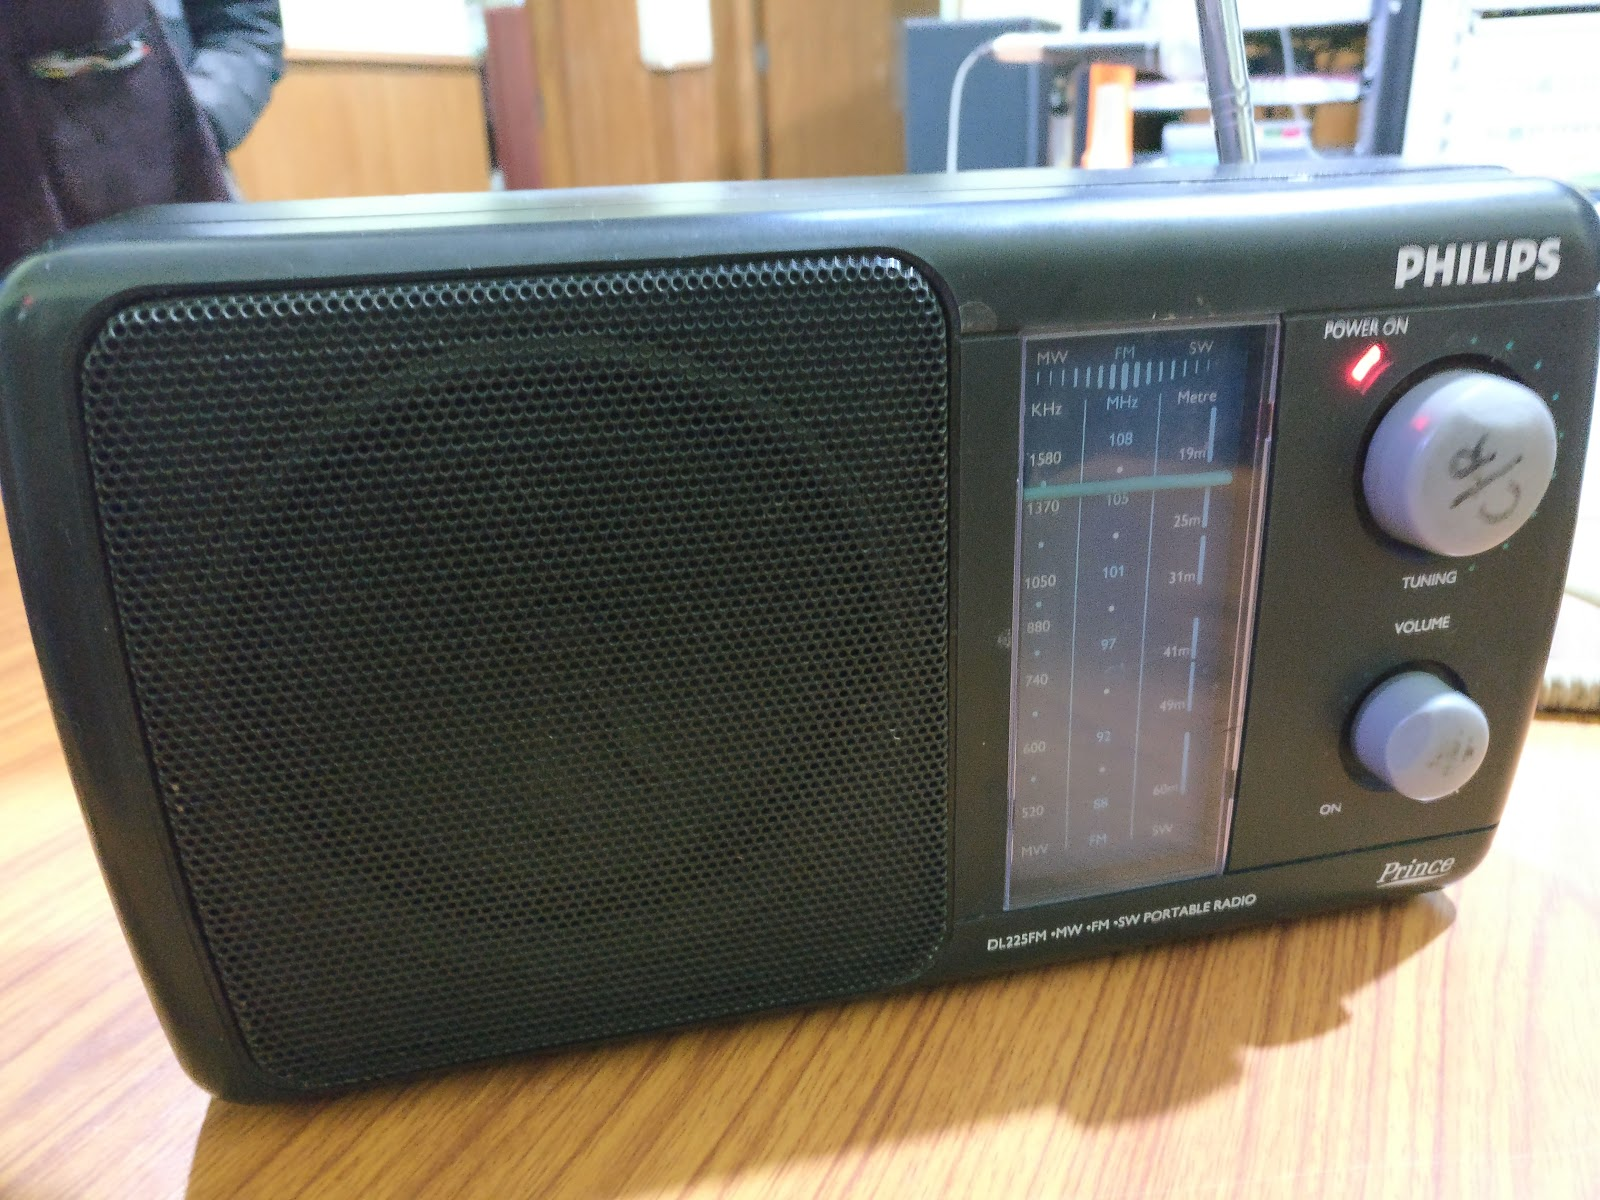 Patteriradio